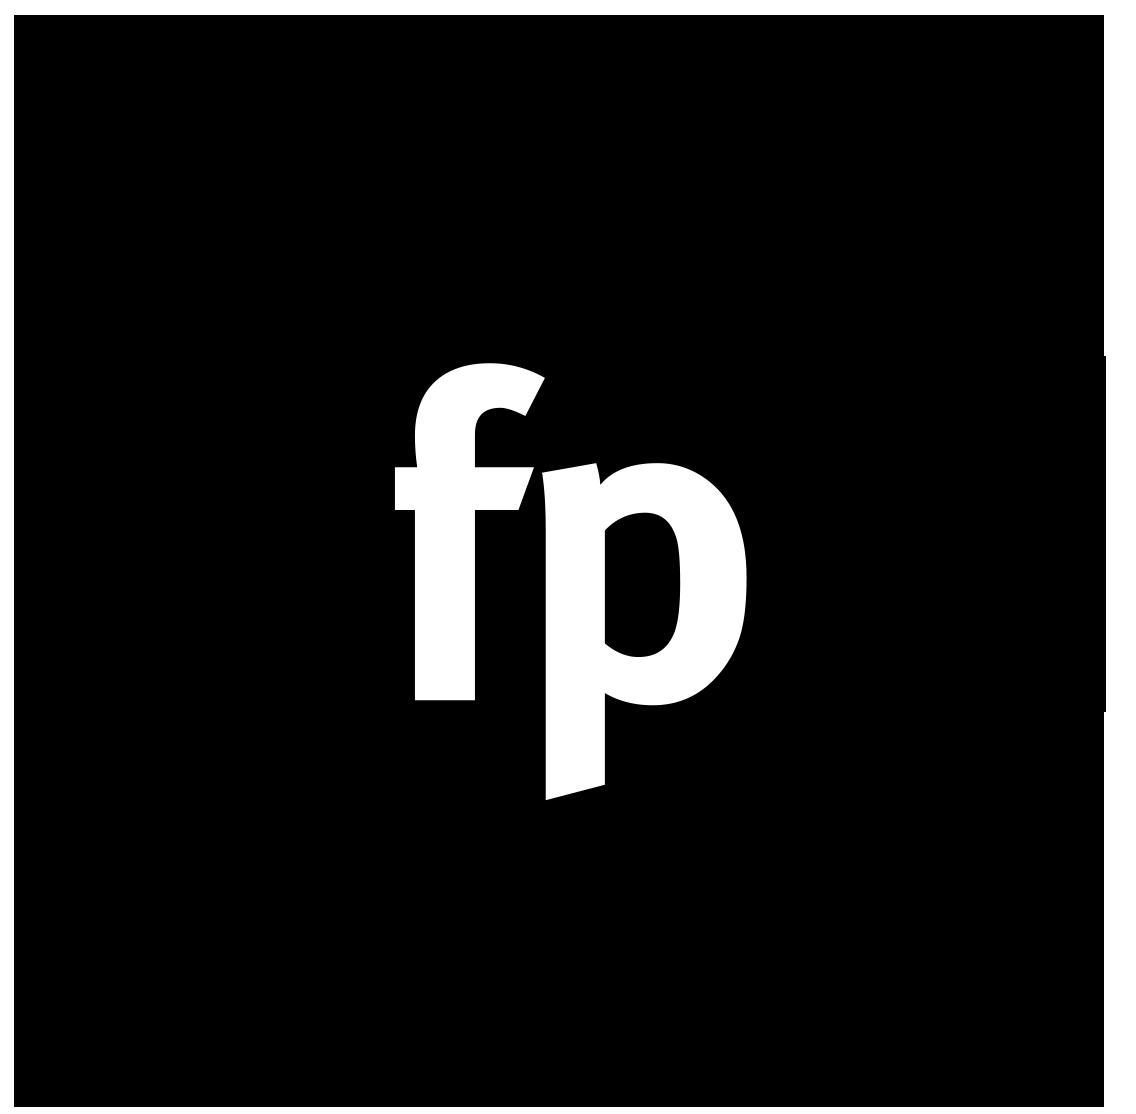 logo FP ARchitercture